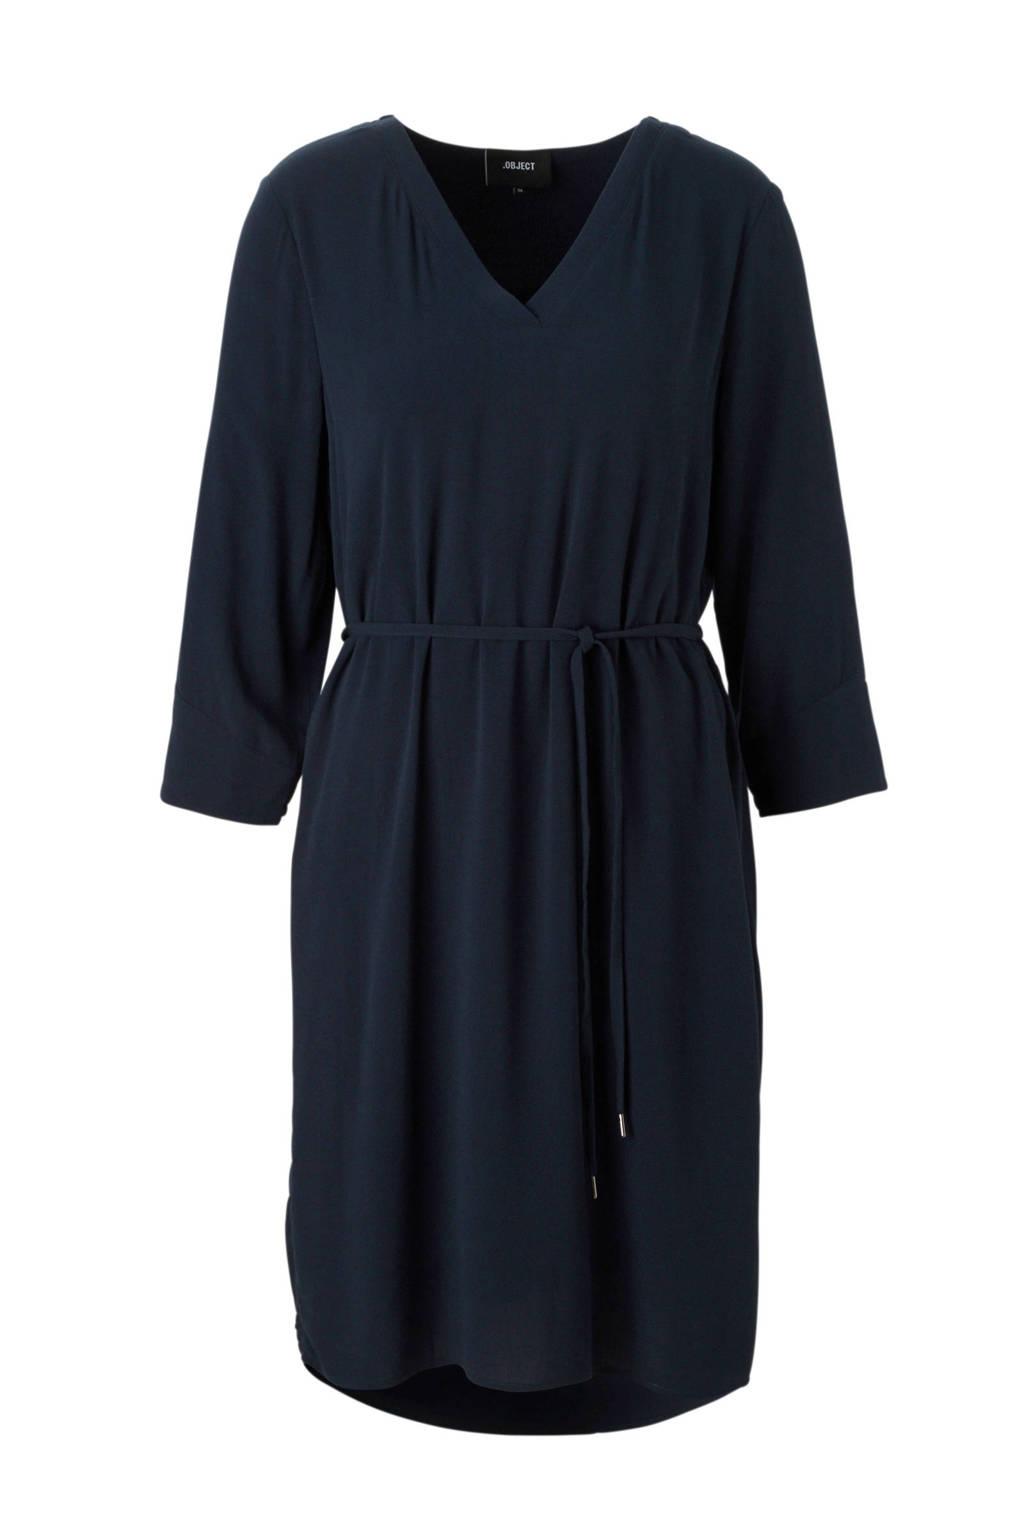 OBJECT jurk, Blauw